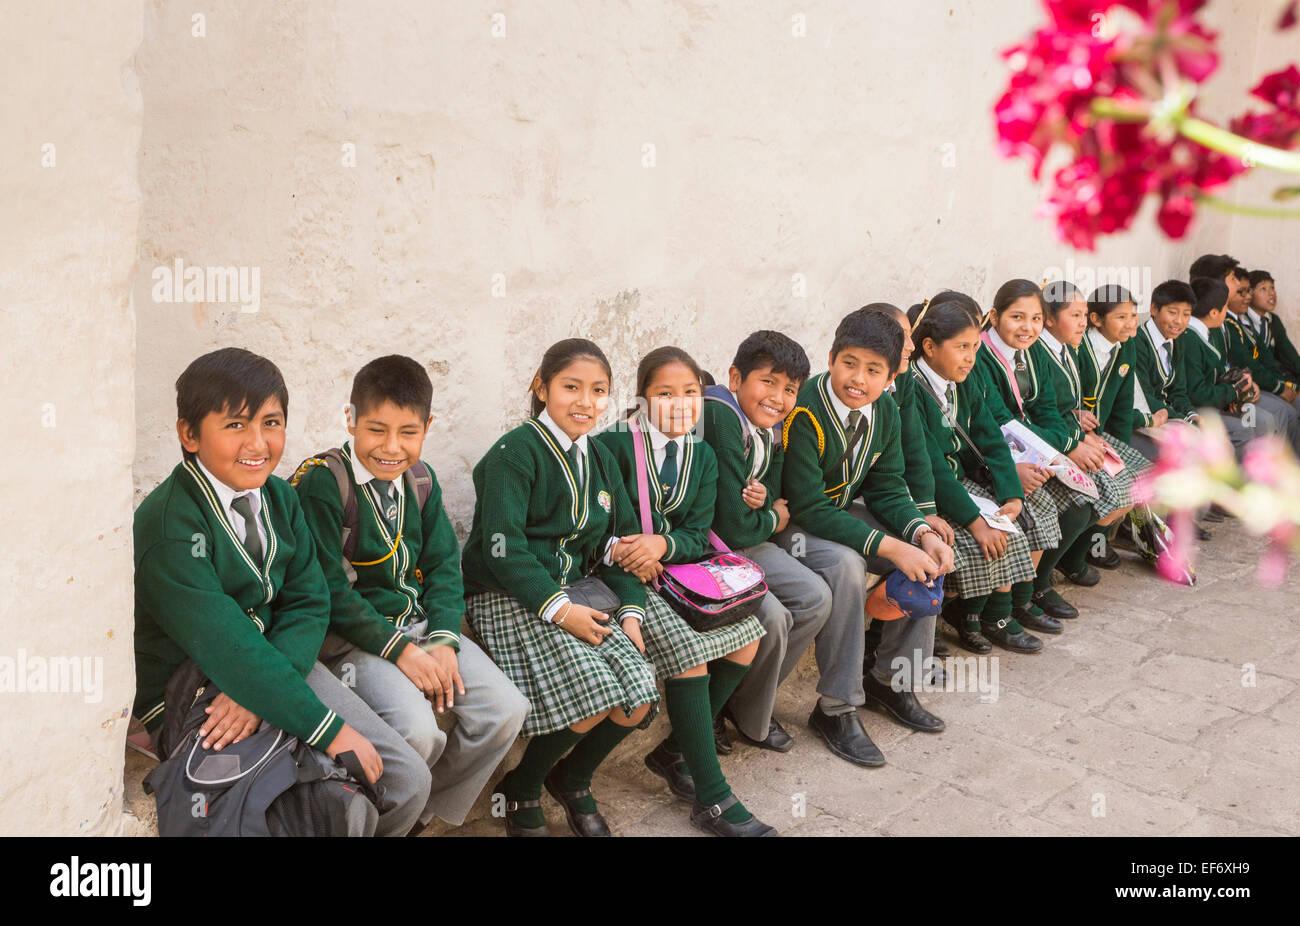 Local happy Peruvian schoolchildren in school uniform sitting on a bench having fun enjoying visiting Santa Catalina - Stock Image